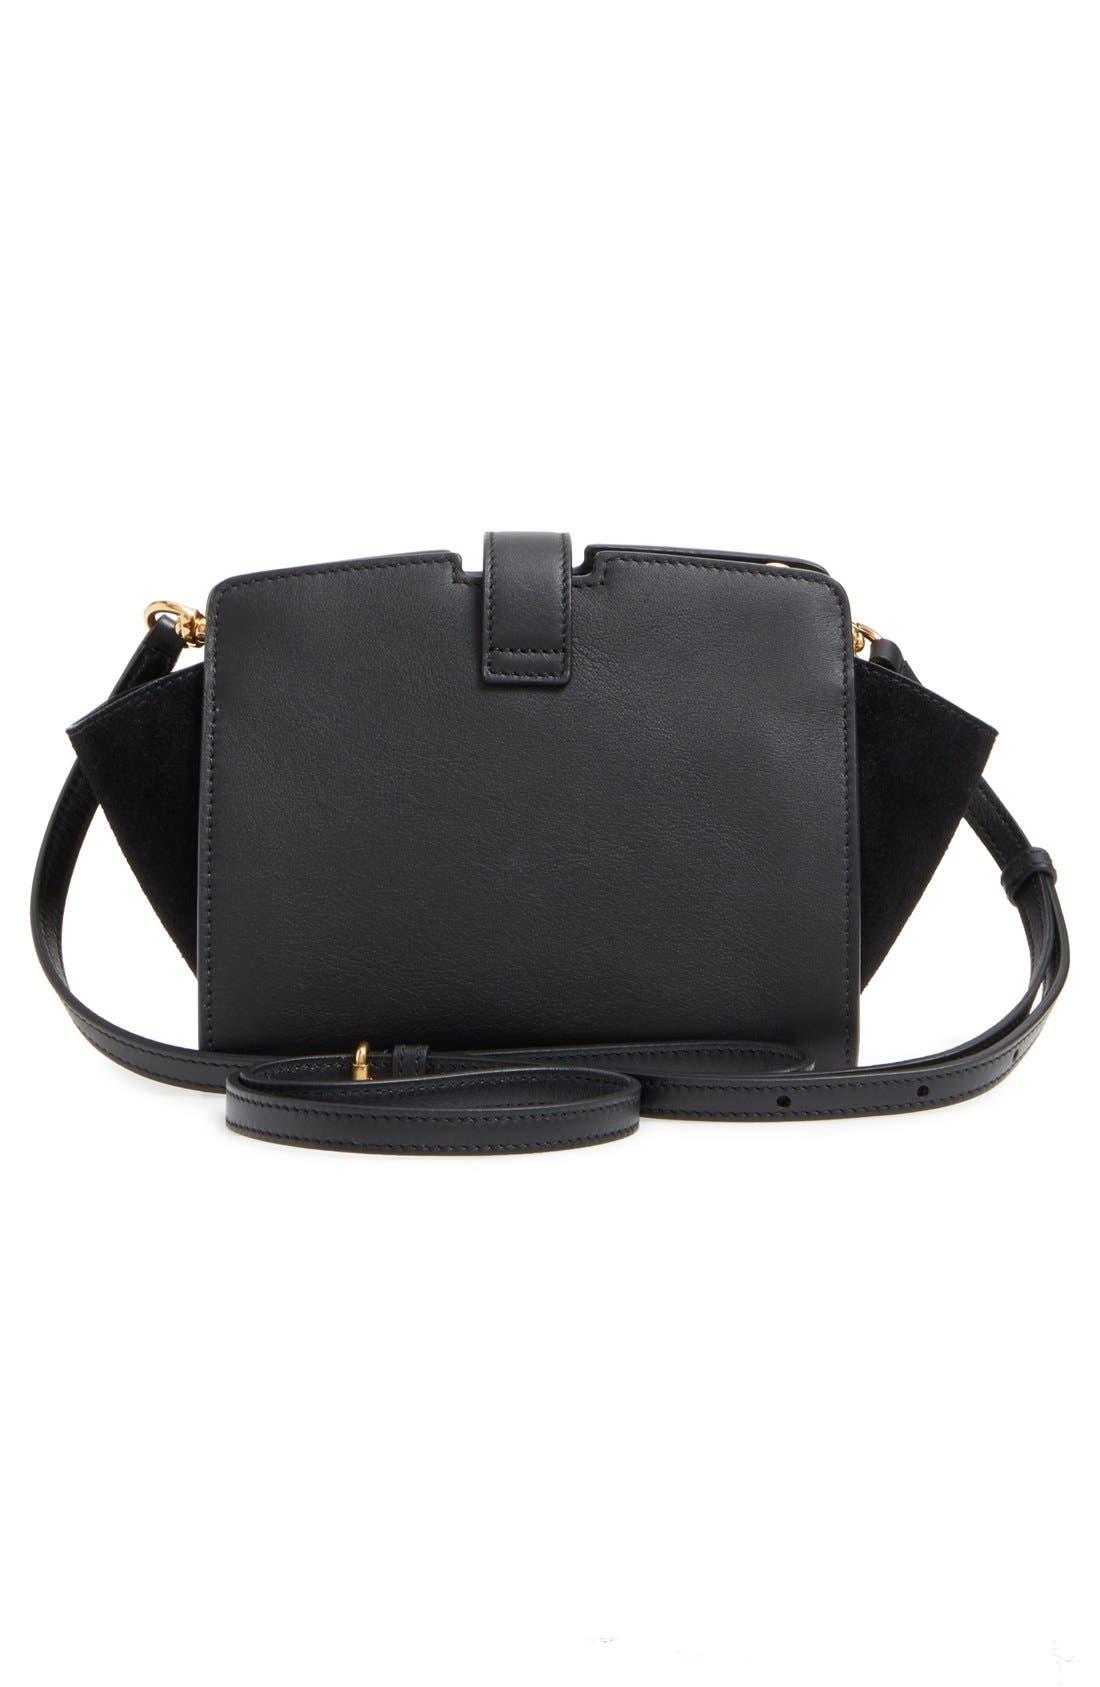 Alternate Image 3  - Saint Laurent Toy Cabas Leather Crossbody Bag